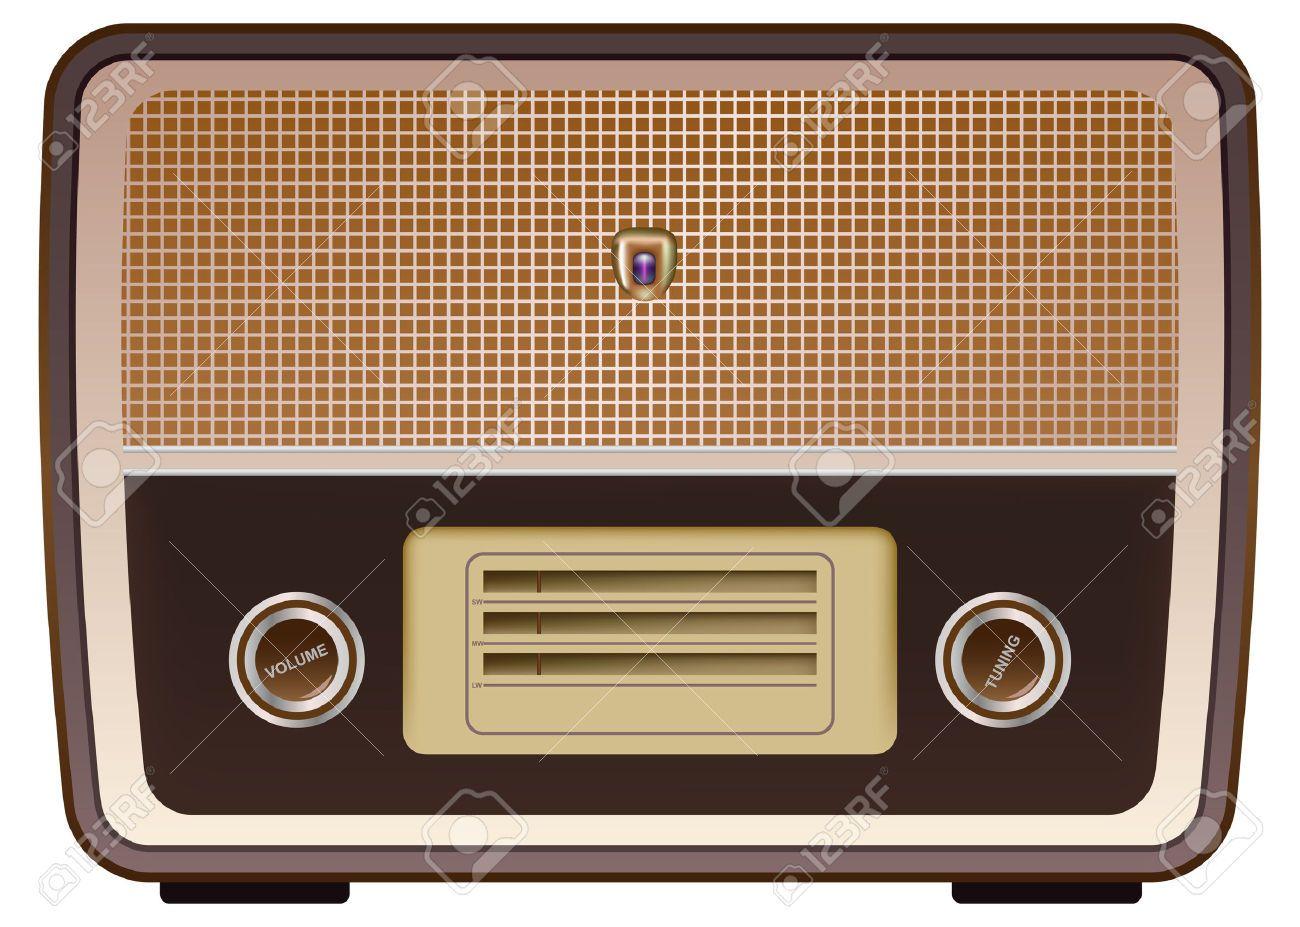 Google image result for http image spreadshirt com image server v1 - Vector Photo Realistic Vintage Radio On White Background